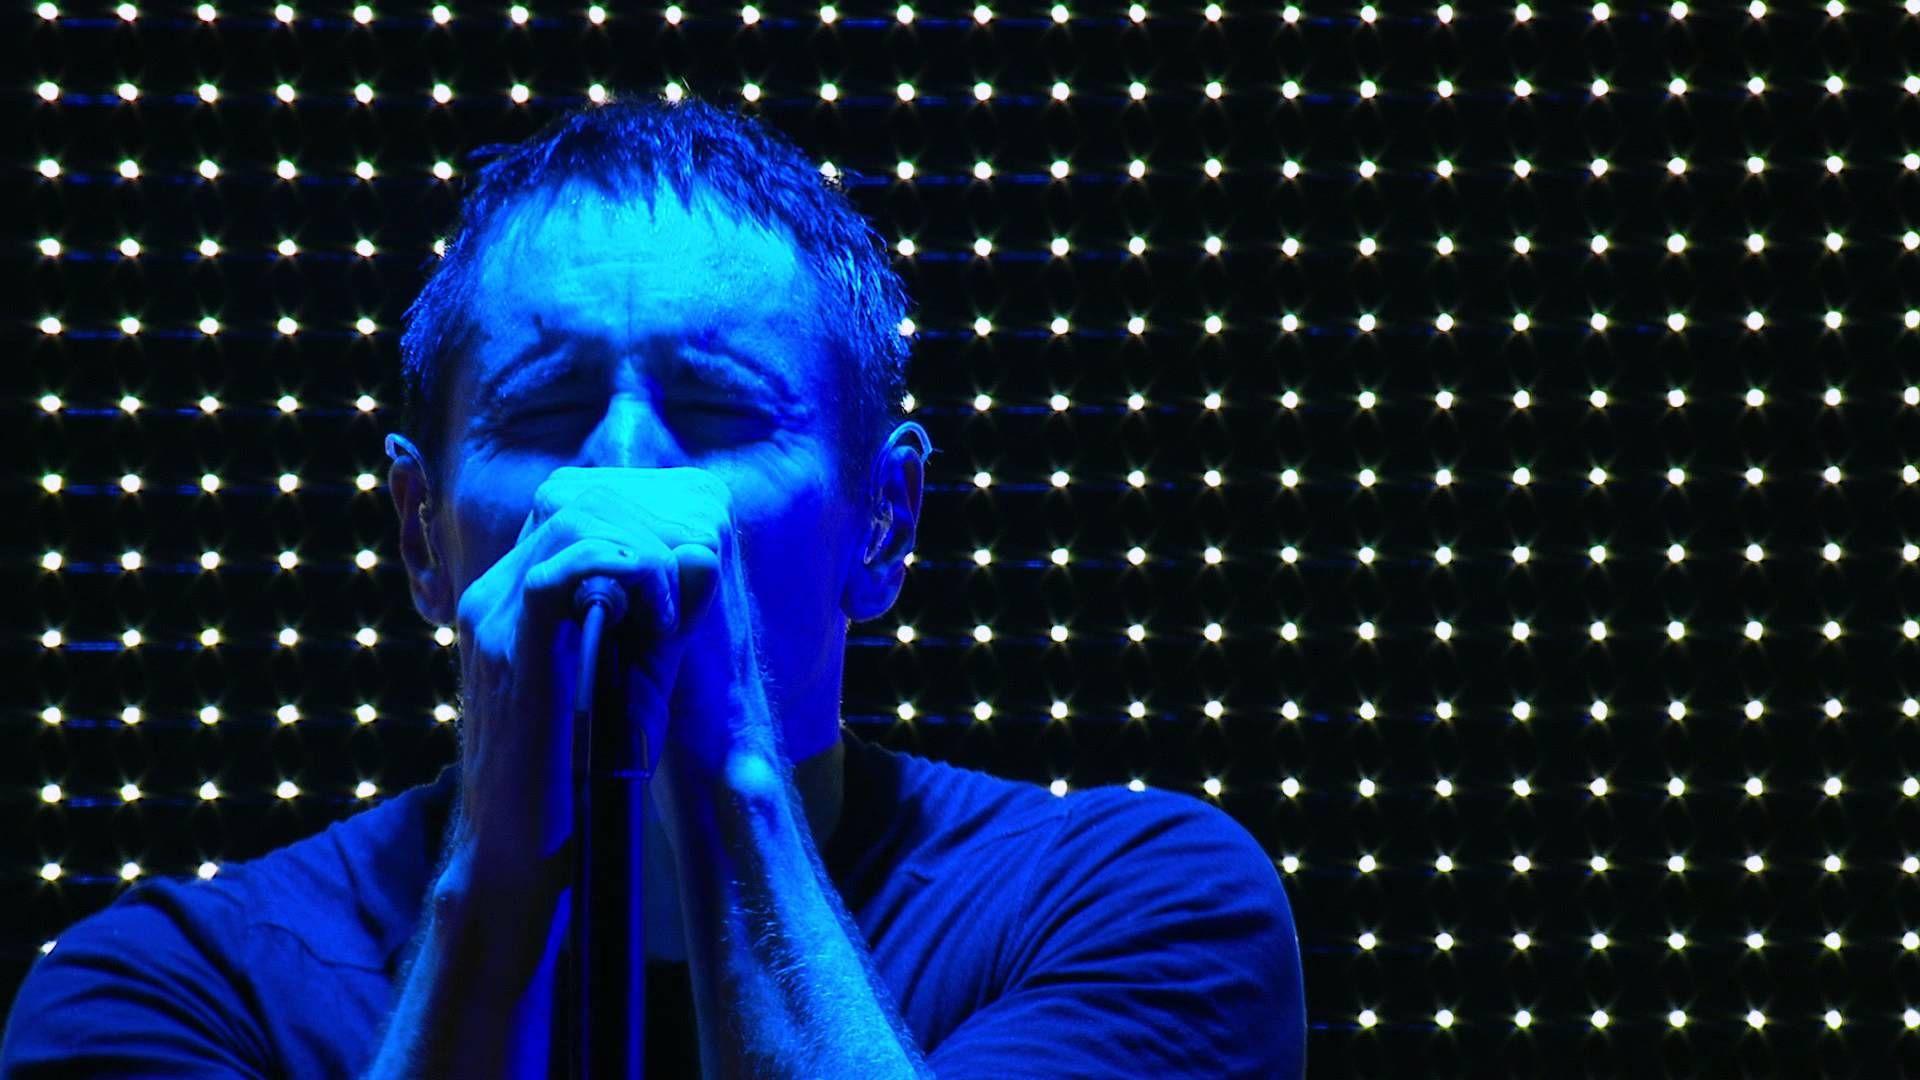 Nine Inch Nails - Hurt (VEVO Presents)   ~NIN~   Pinterest   Trent ...